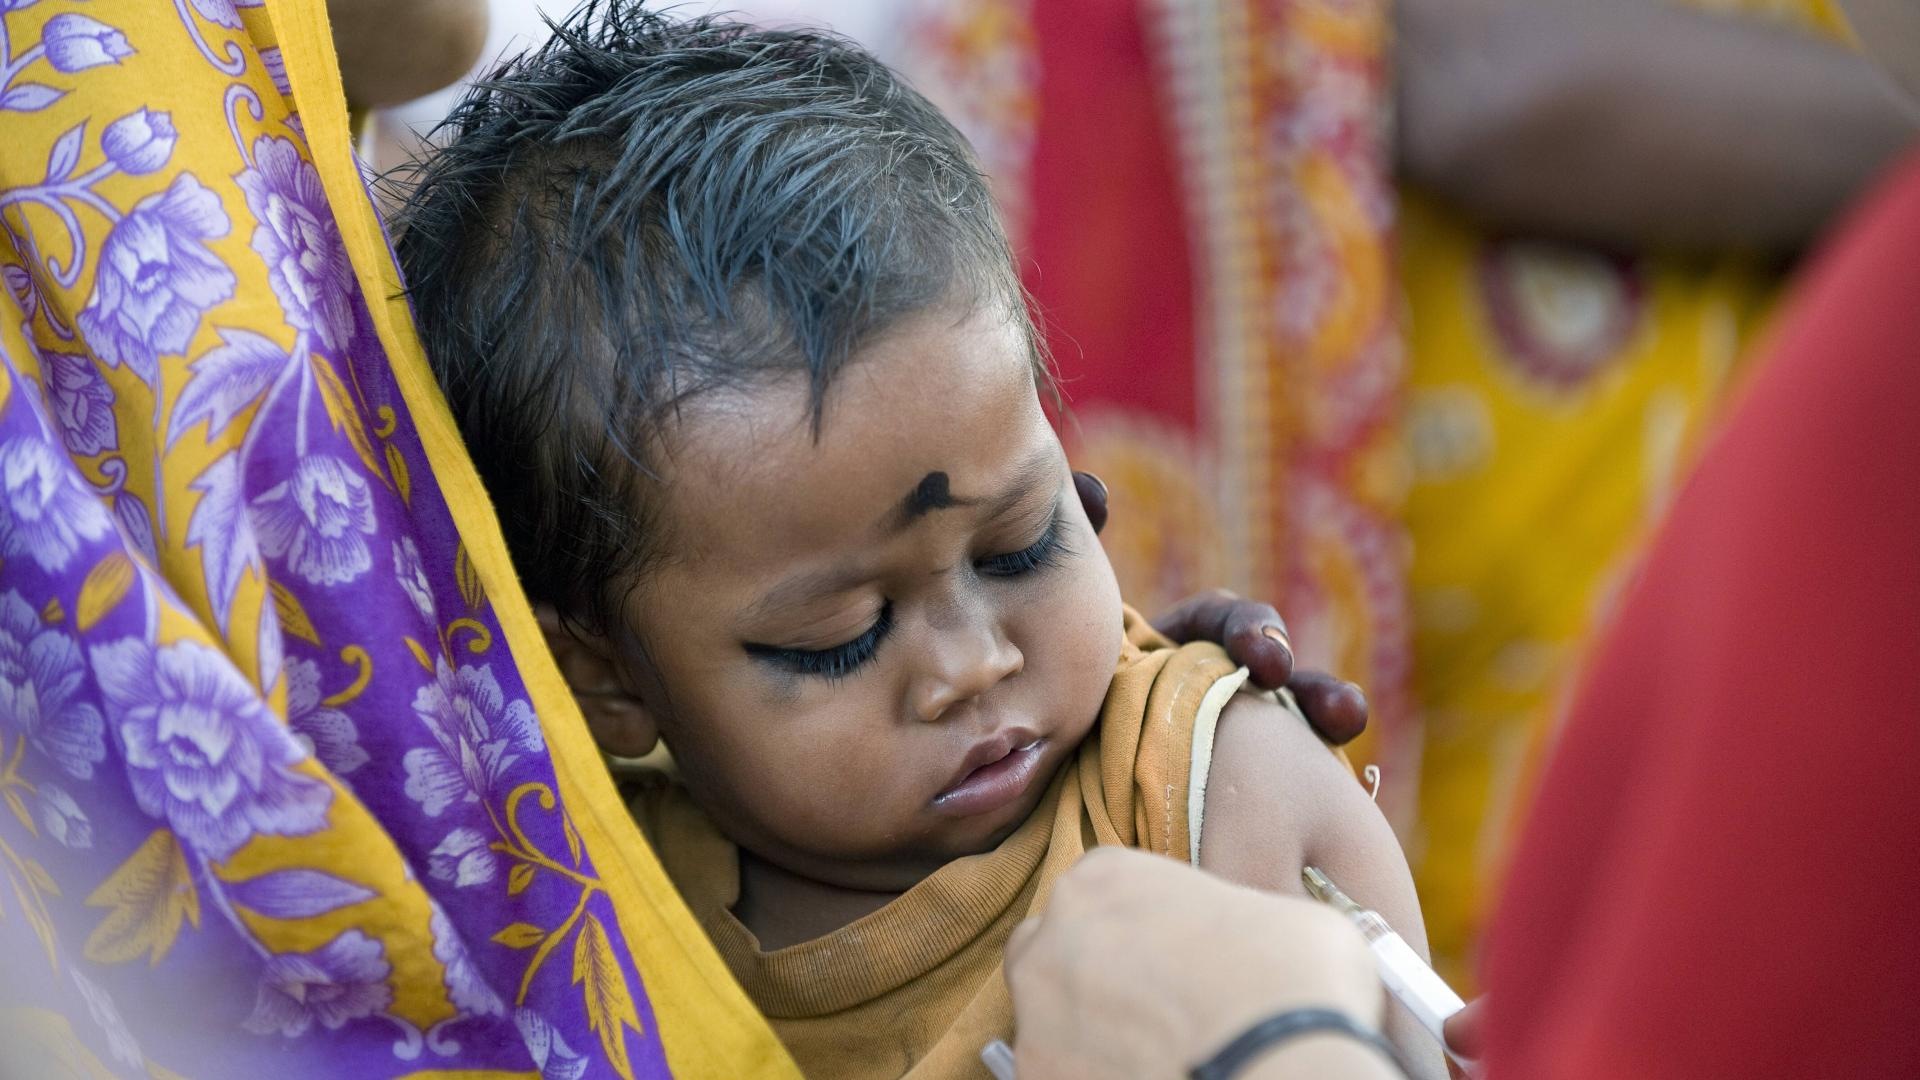 impfung kind corona baby krank arzt